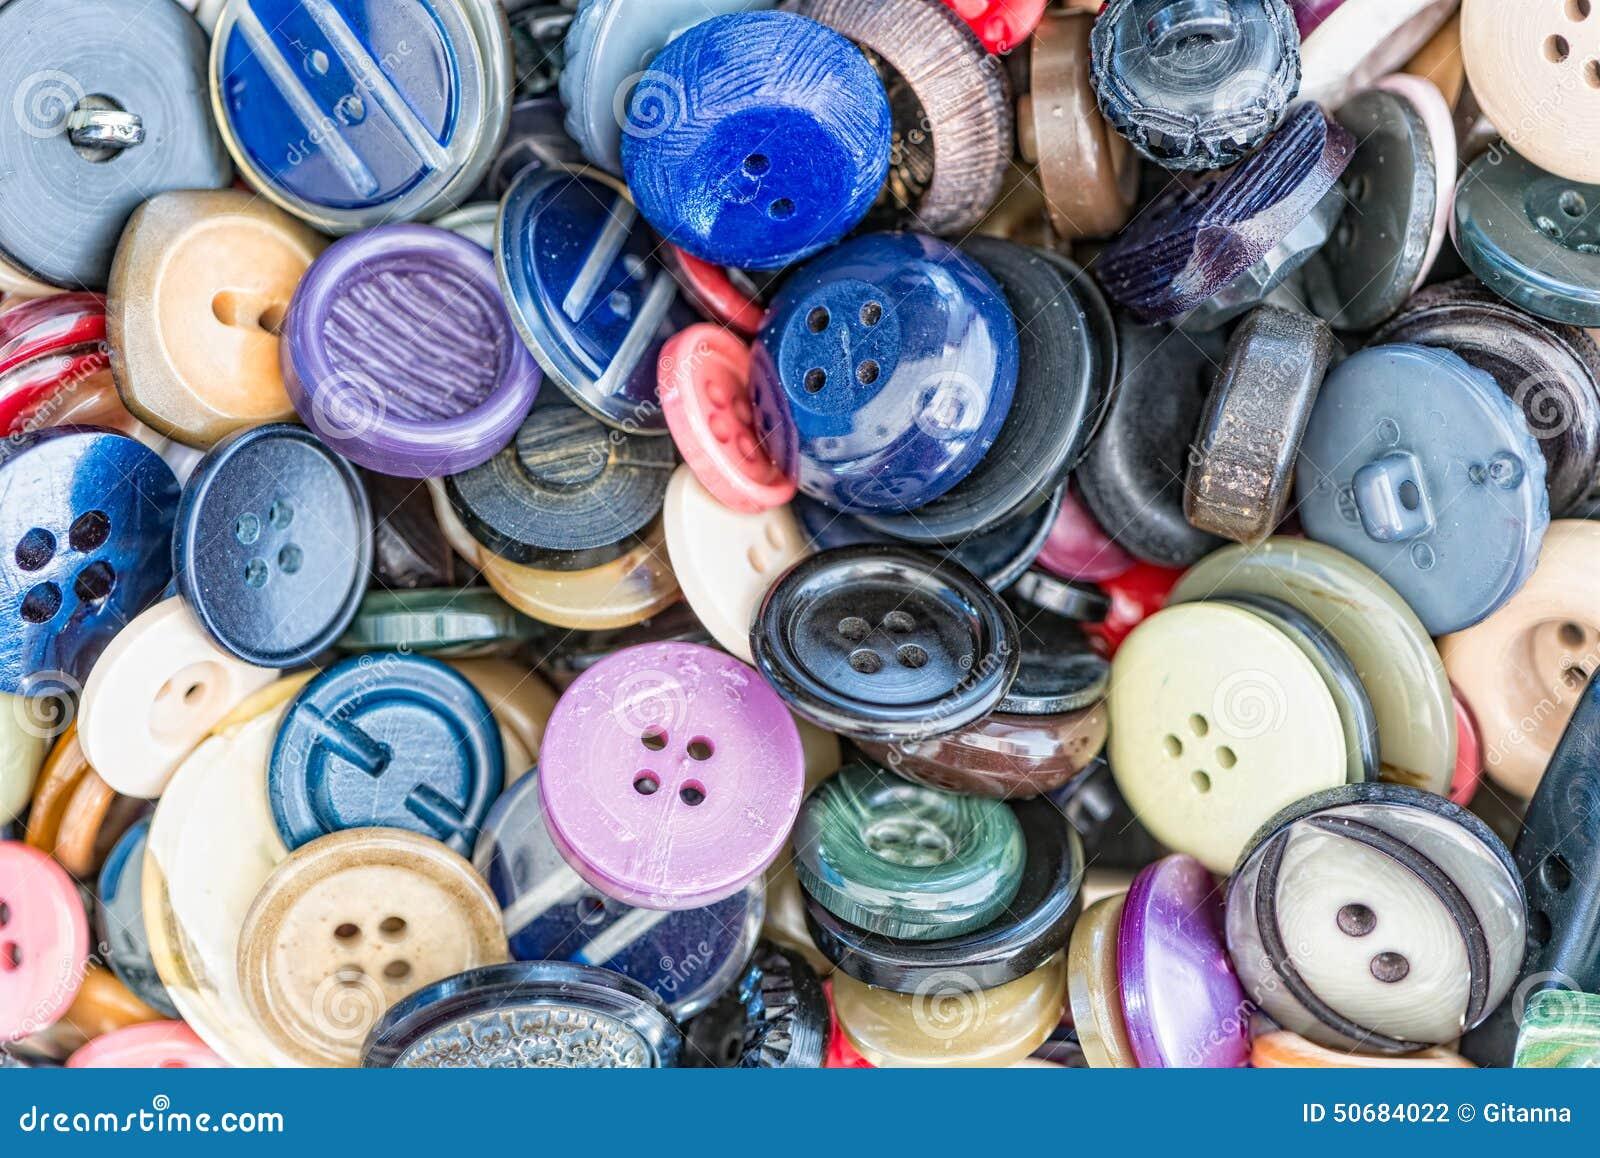 Download 衣裳的按钮 库存照片. 图片 包括有 五颜六色, 刺绣, 礼服, 收集, 设计, 蓝色, 衣物, 金属, 按钮 - 50684022